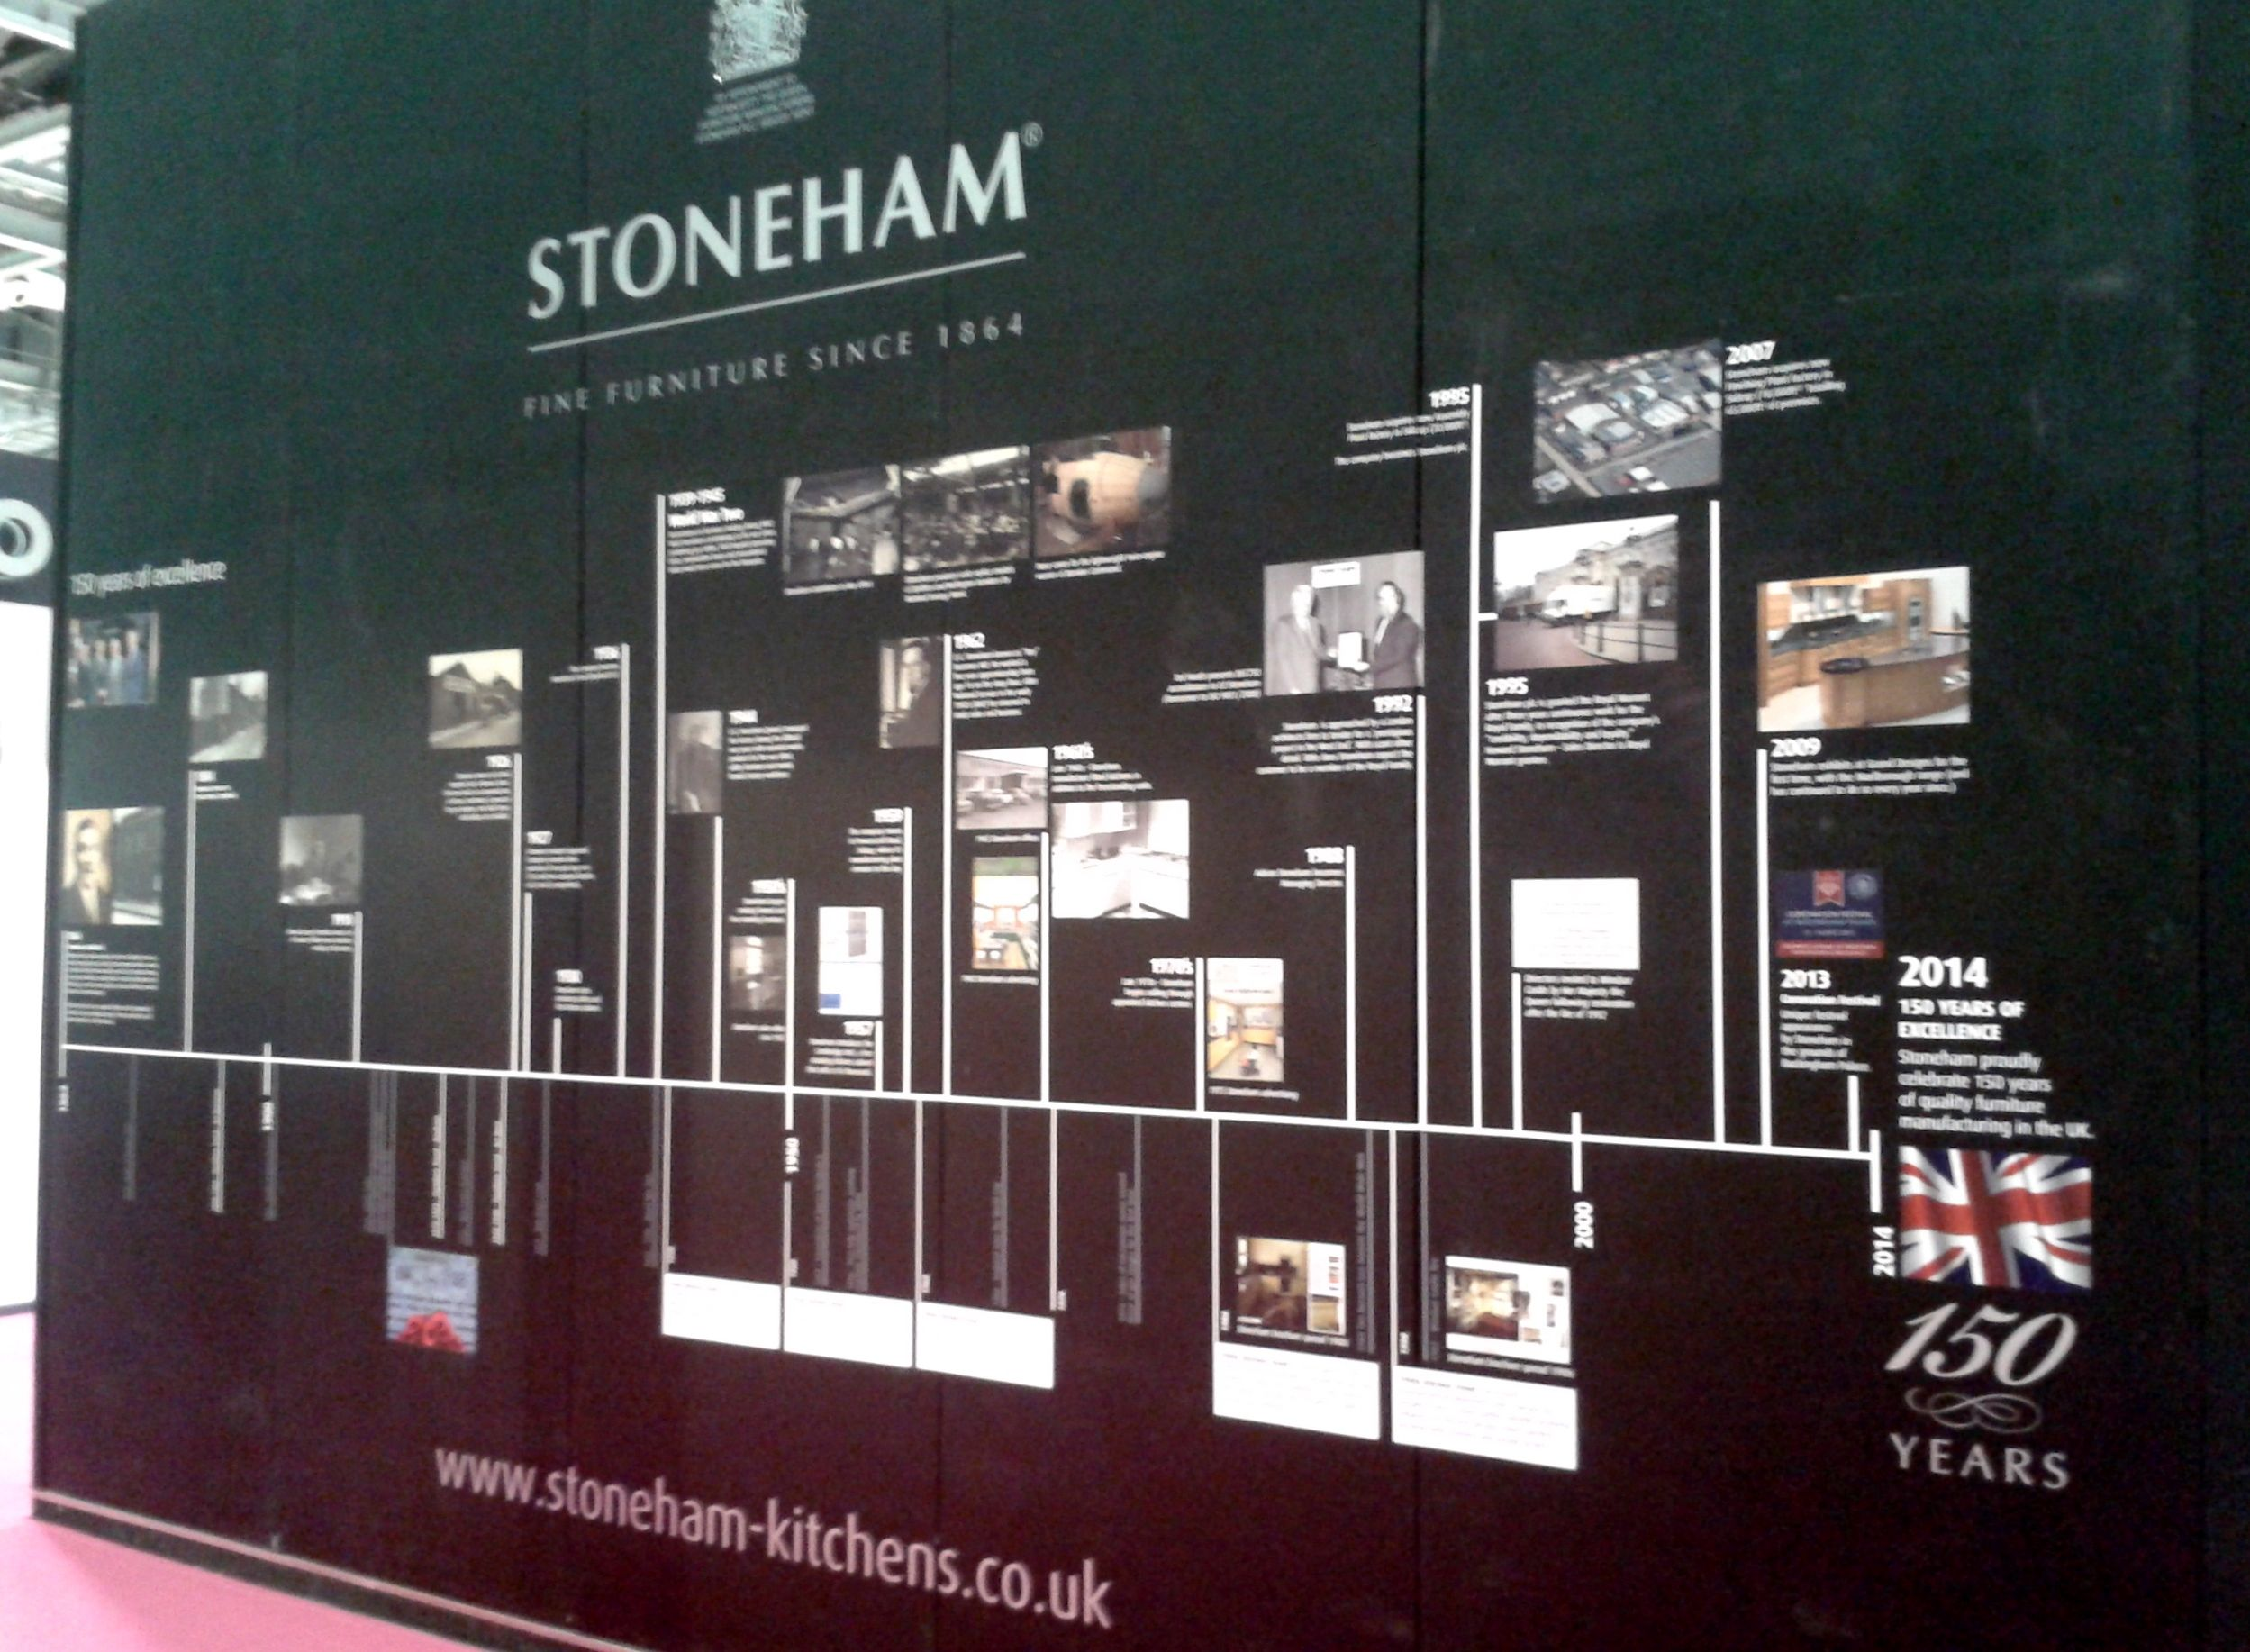 150 years of stoneham kitchens timeline at grand designs live 2014 kitchen design british on kitchen remodel timeline id=80167